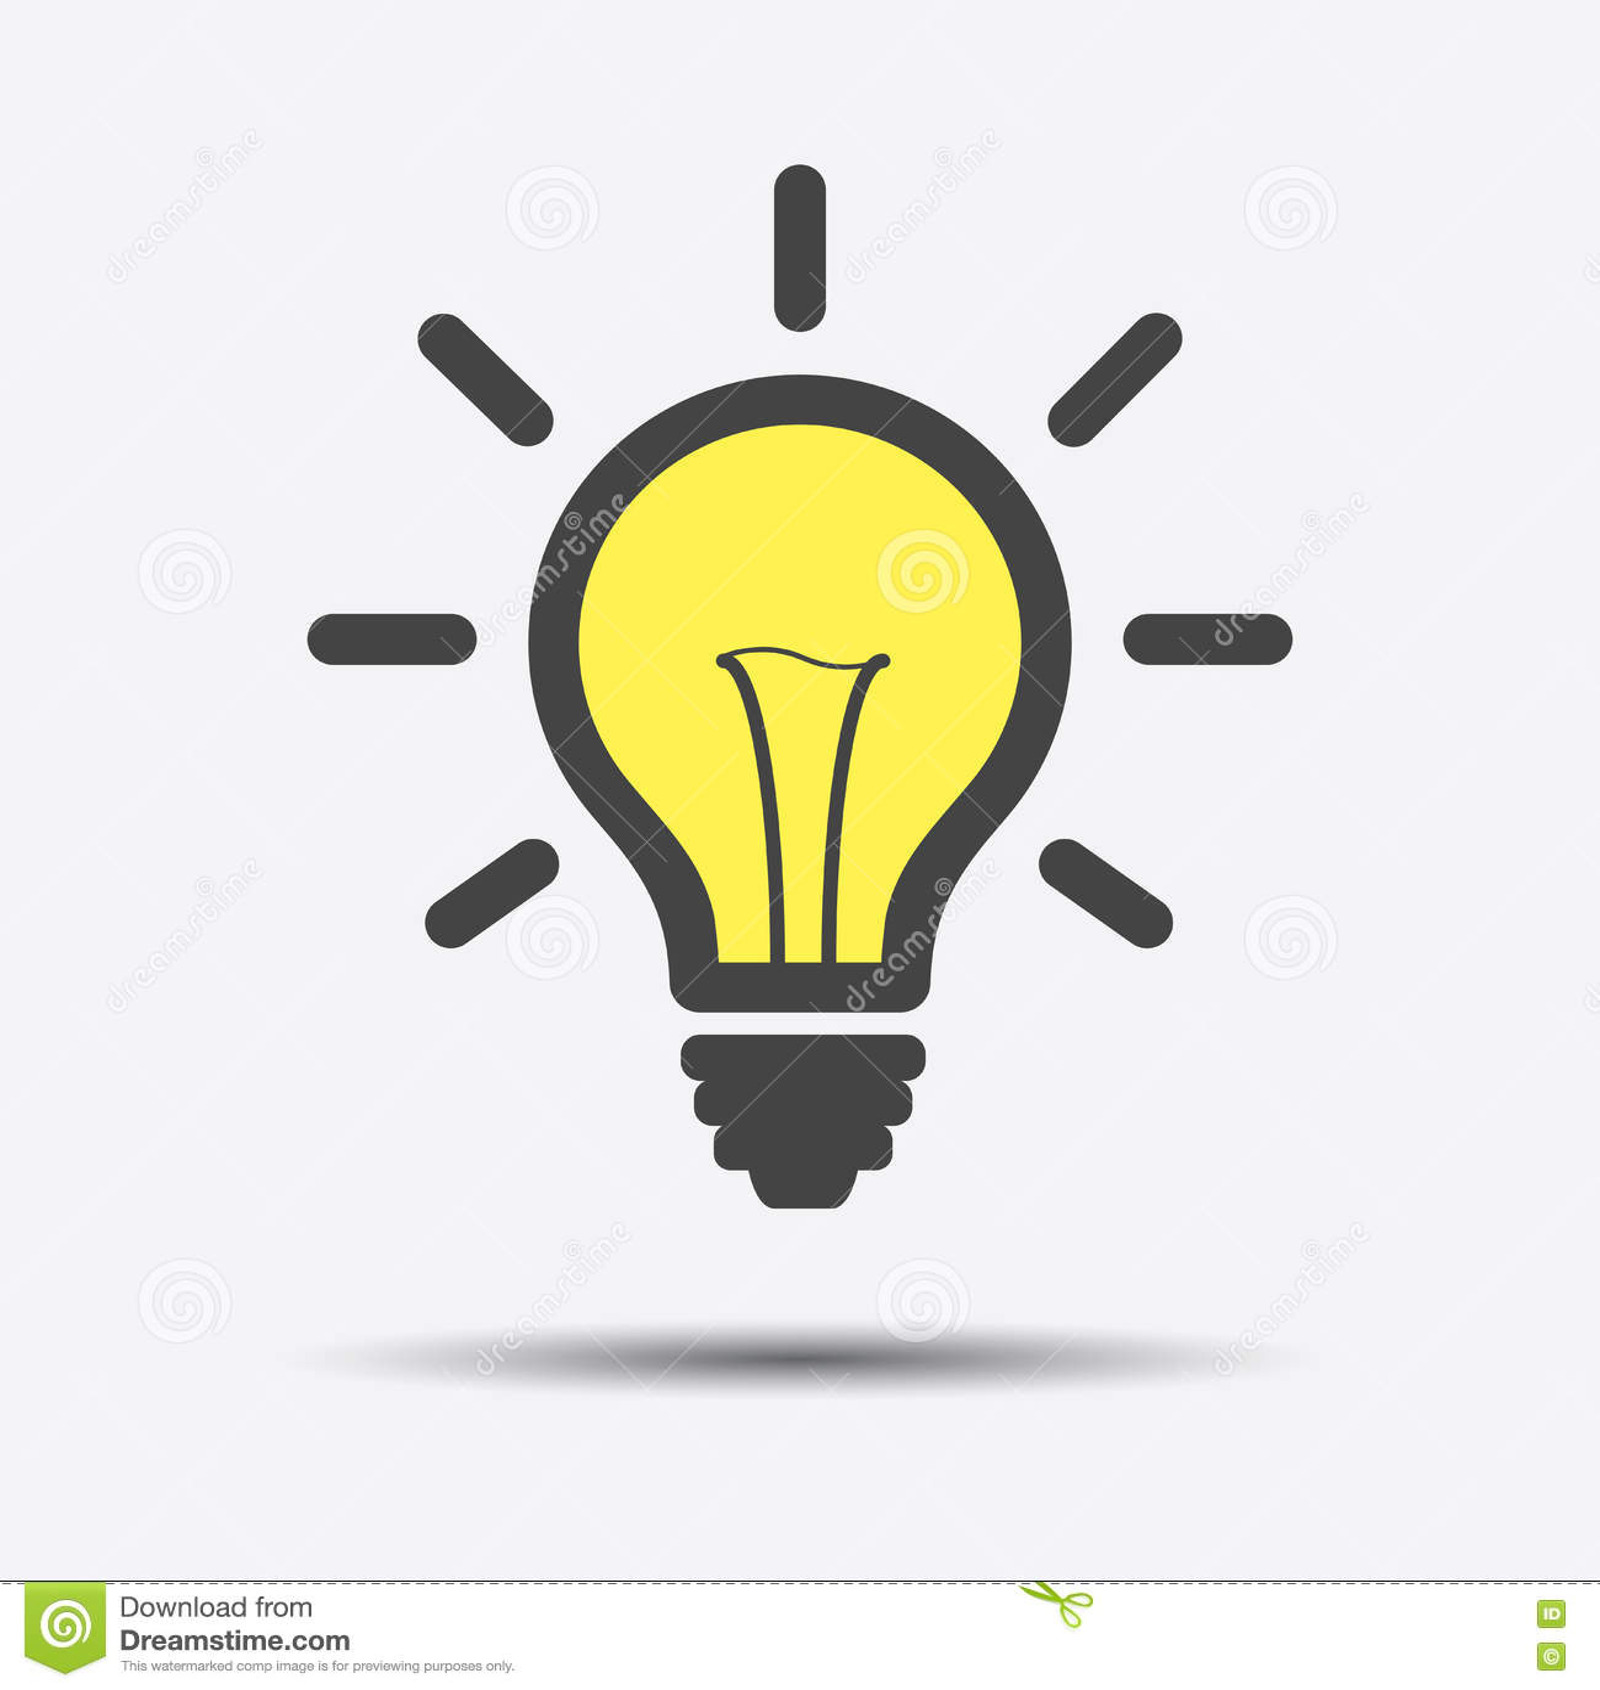 Bulb Light Isolated Icon Stock Illustration ...